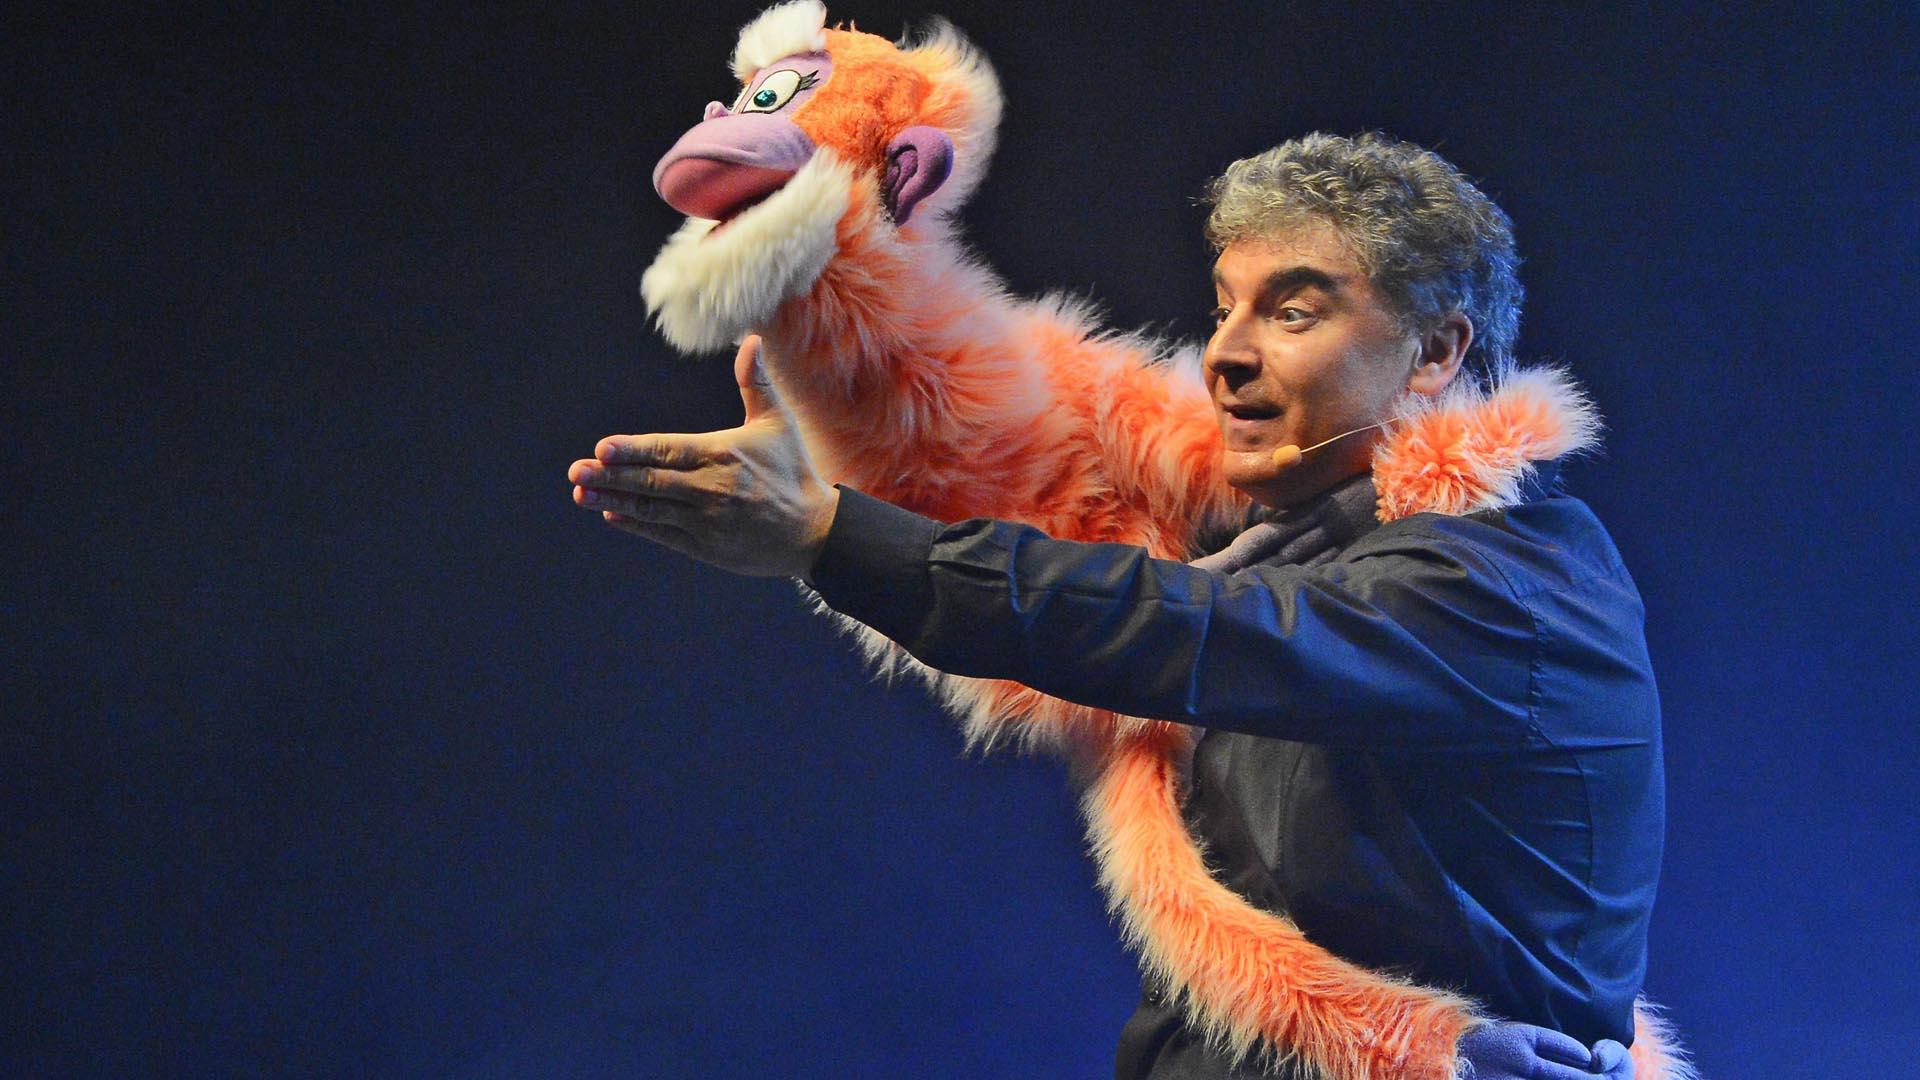 Christian Gabriel ventriloquie